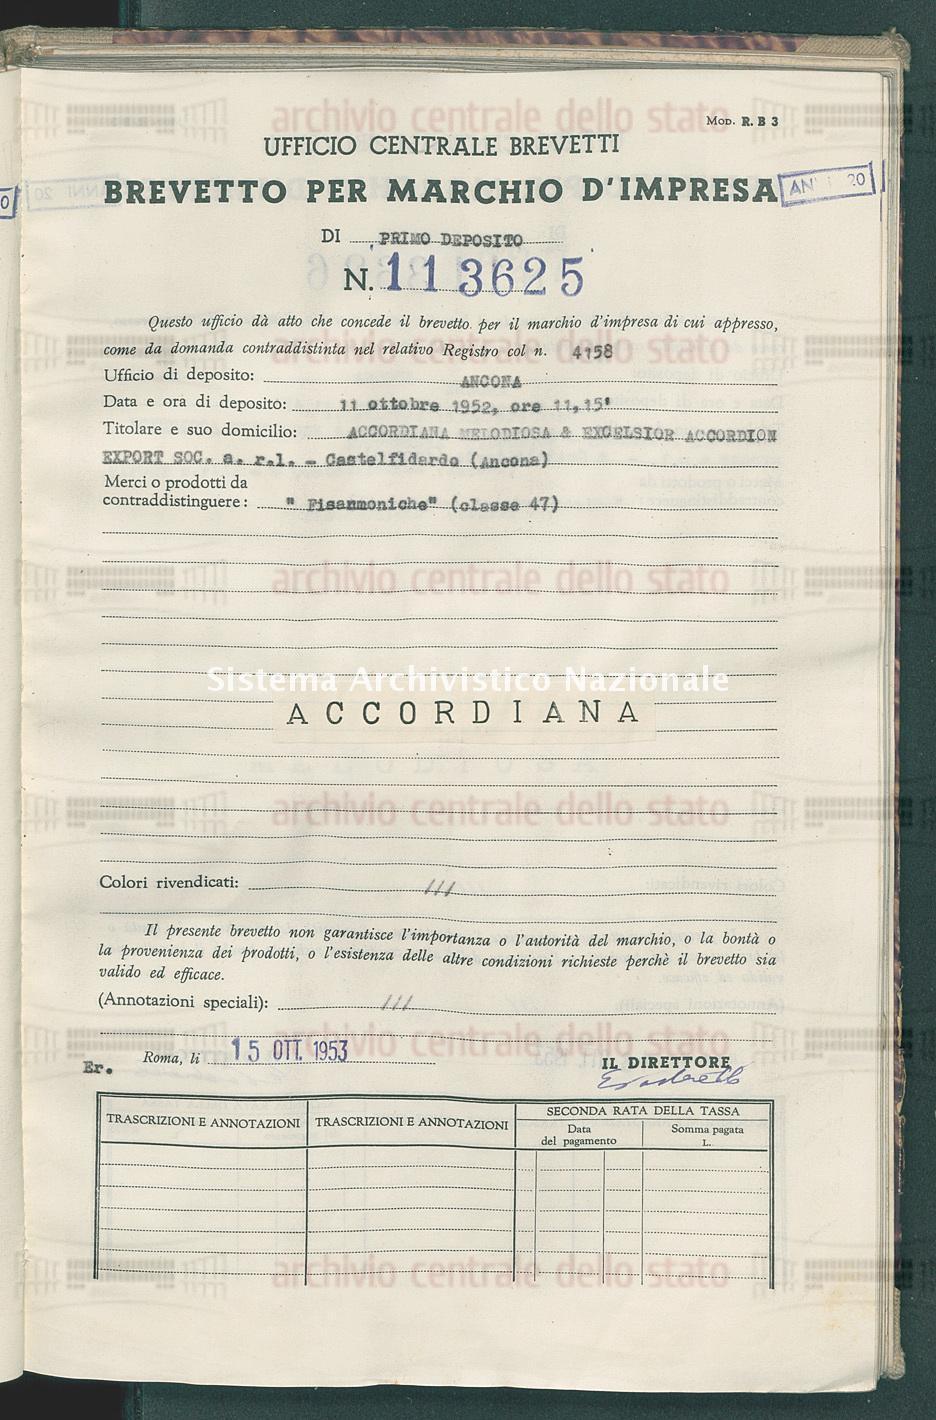 'Fisarmoniche' Accordiana Melodiosa & Excelsior Accordion Export Soc. A R.L. (15/10/1953)